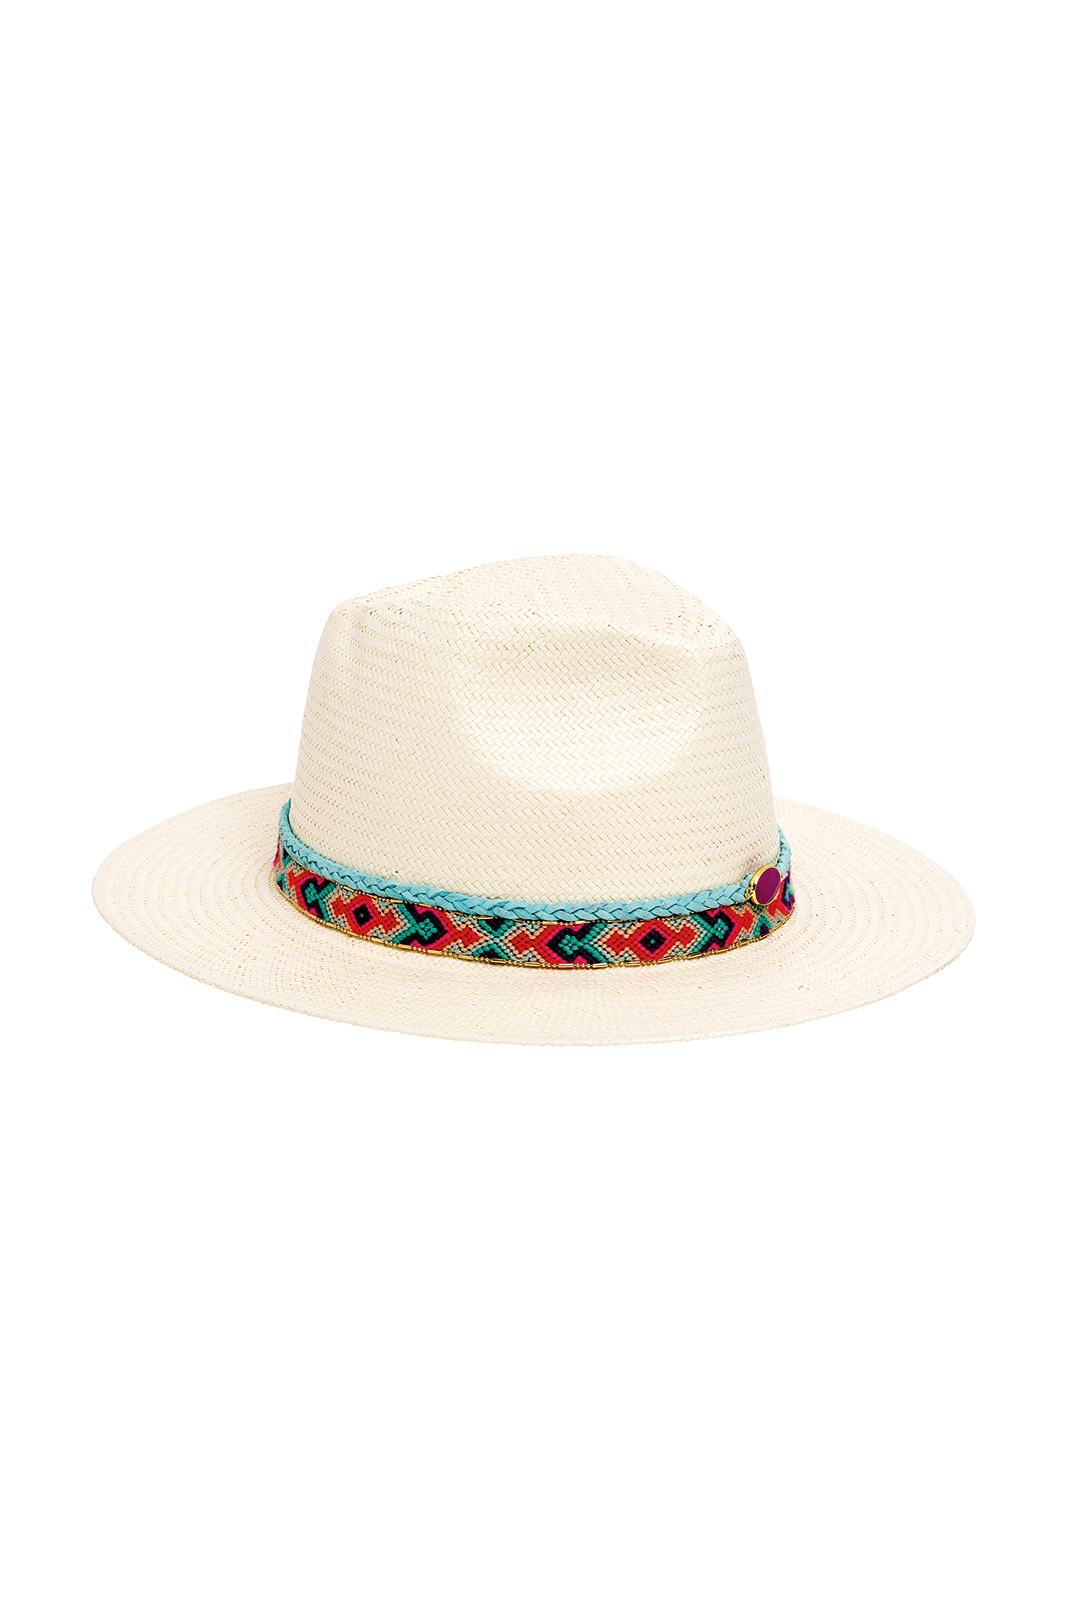 5d6b1ce8 Hat White Straw Hat With Brazilian Belt - Samba White - Brand Amenapih